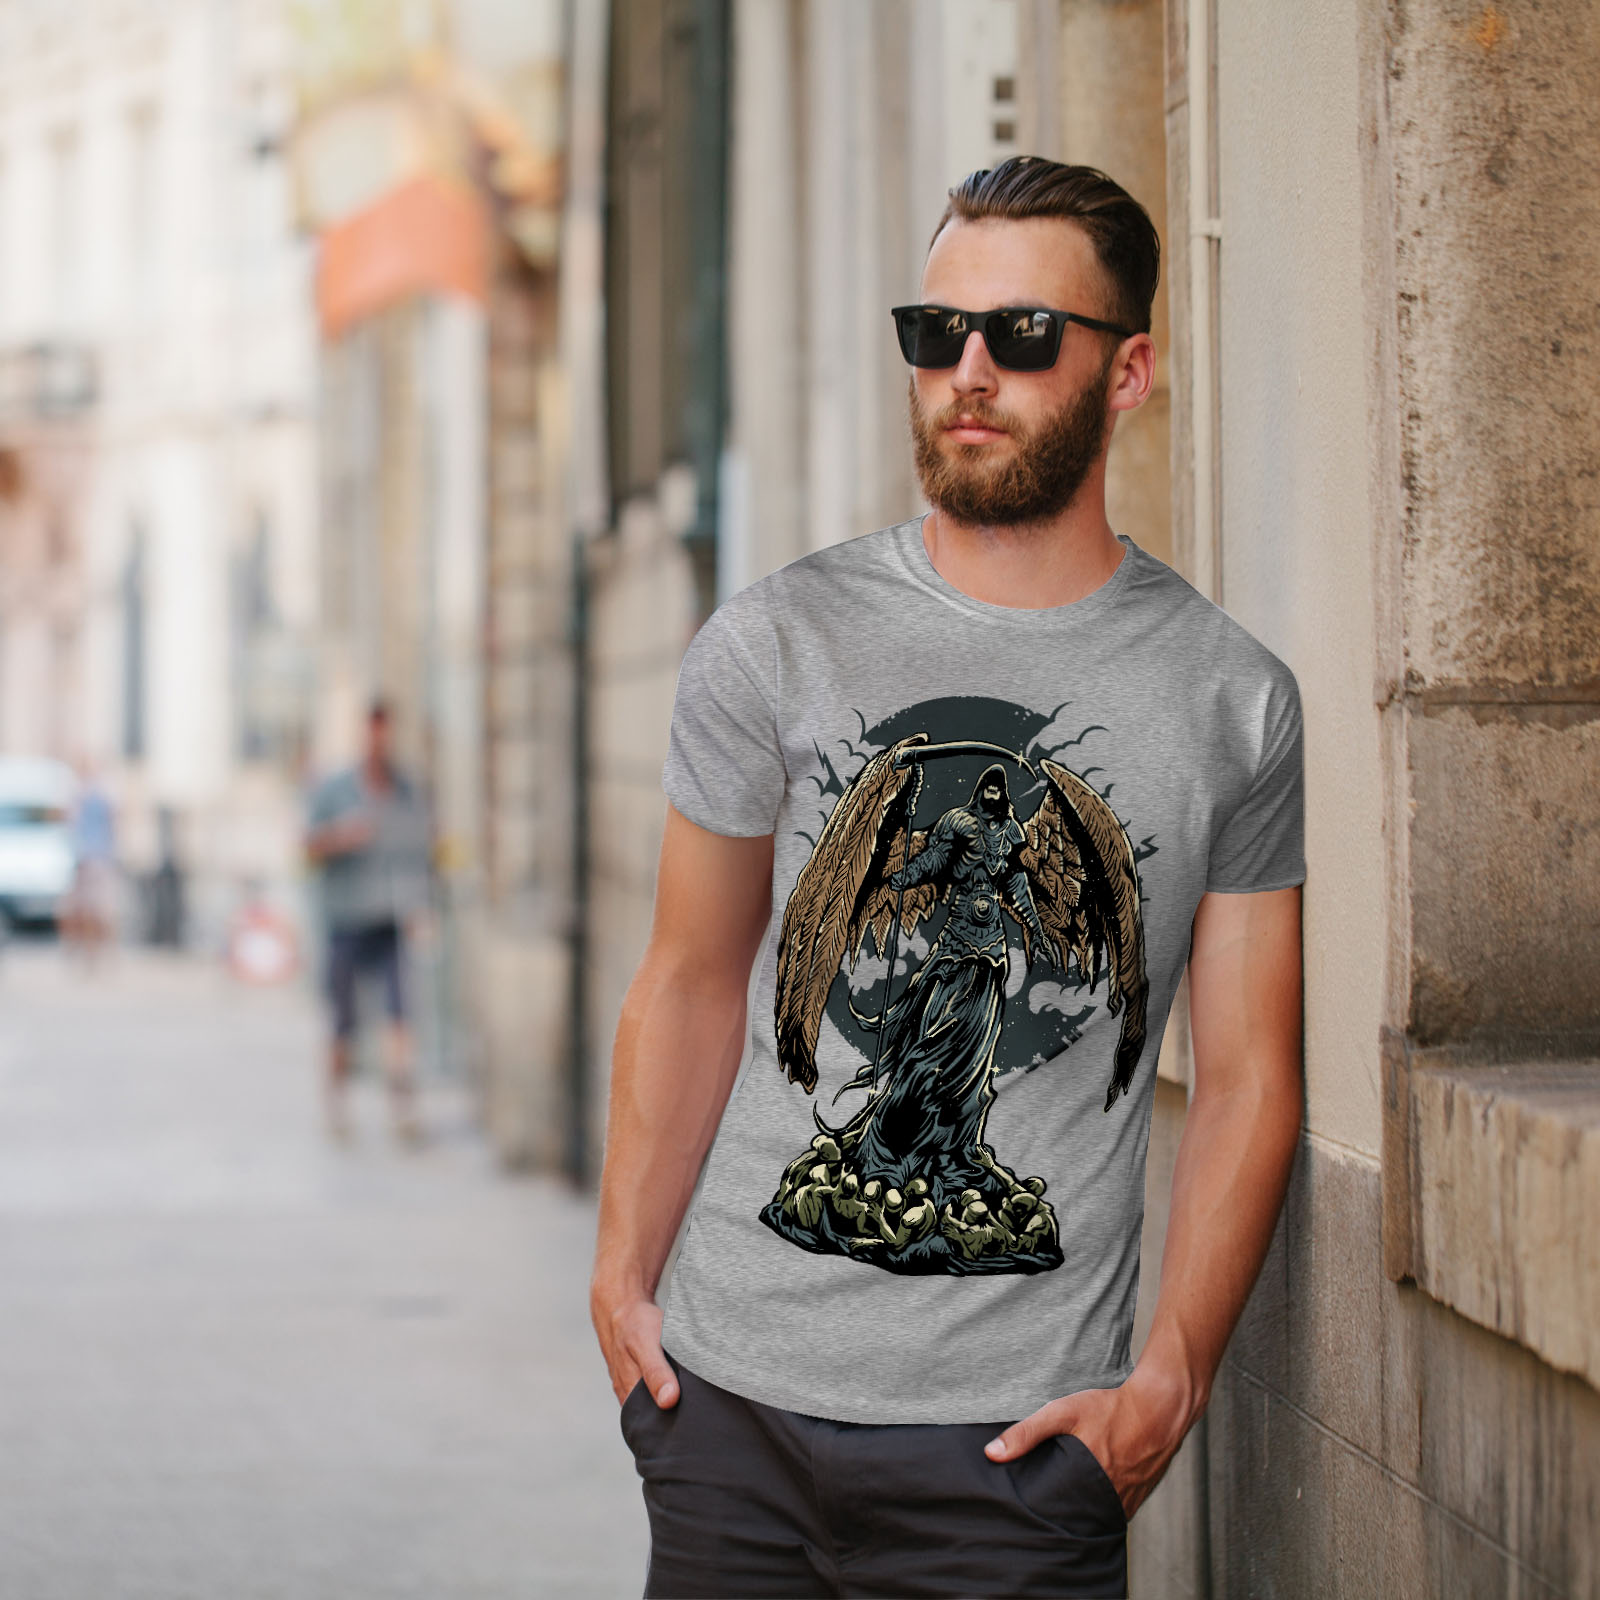 Wellcoda-Evil-Grim-Reaper-Mens-T-shirt-Horror-Graphic-Design-Printed-Tee thumbnail 17